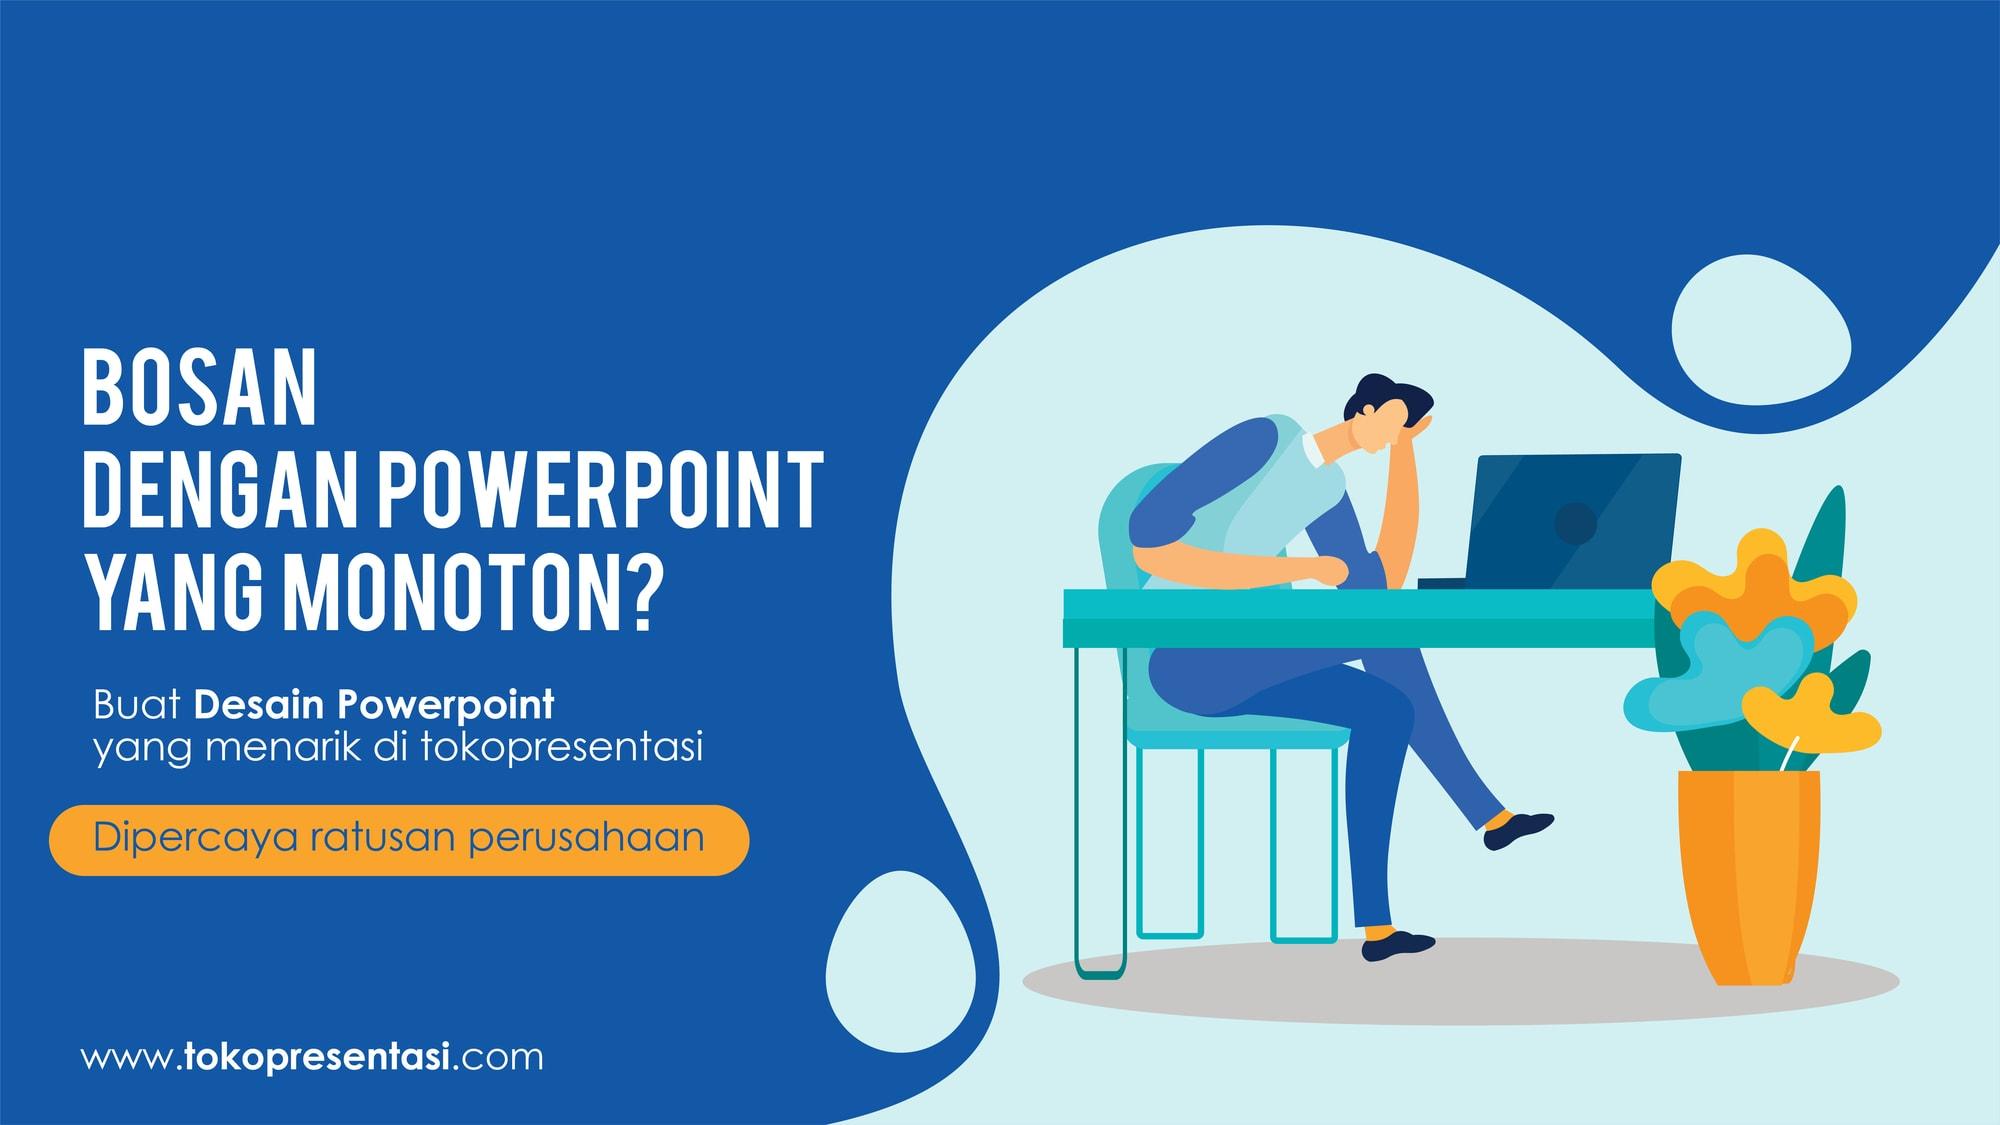 Jasa Pembuatan Desain Presentasi Powerpoint Lomba Inovasi GKM WKM TKMPN Wijaya Karya Tokopresentasi